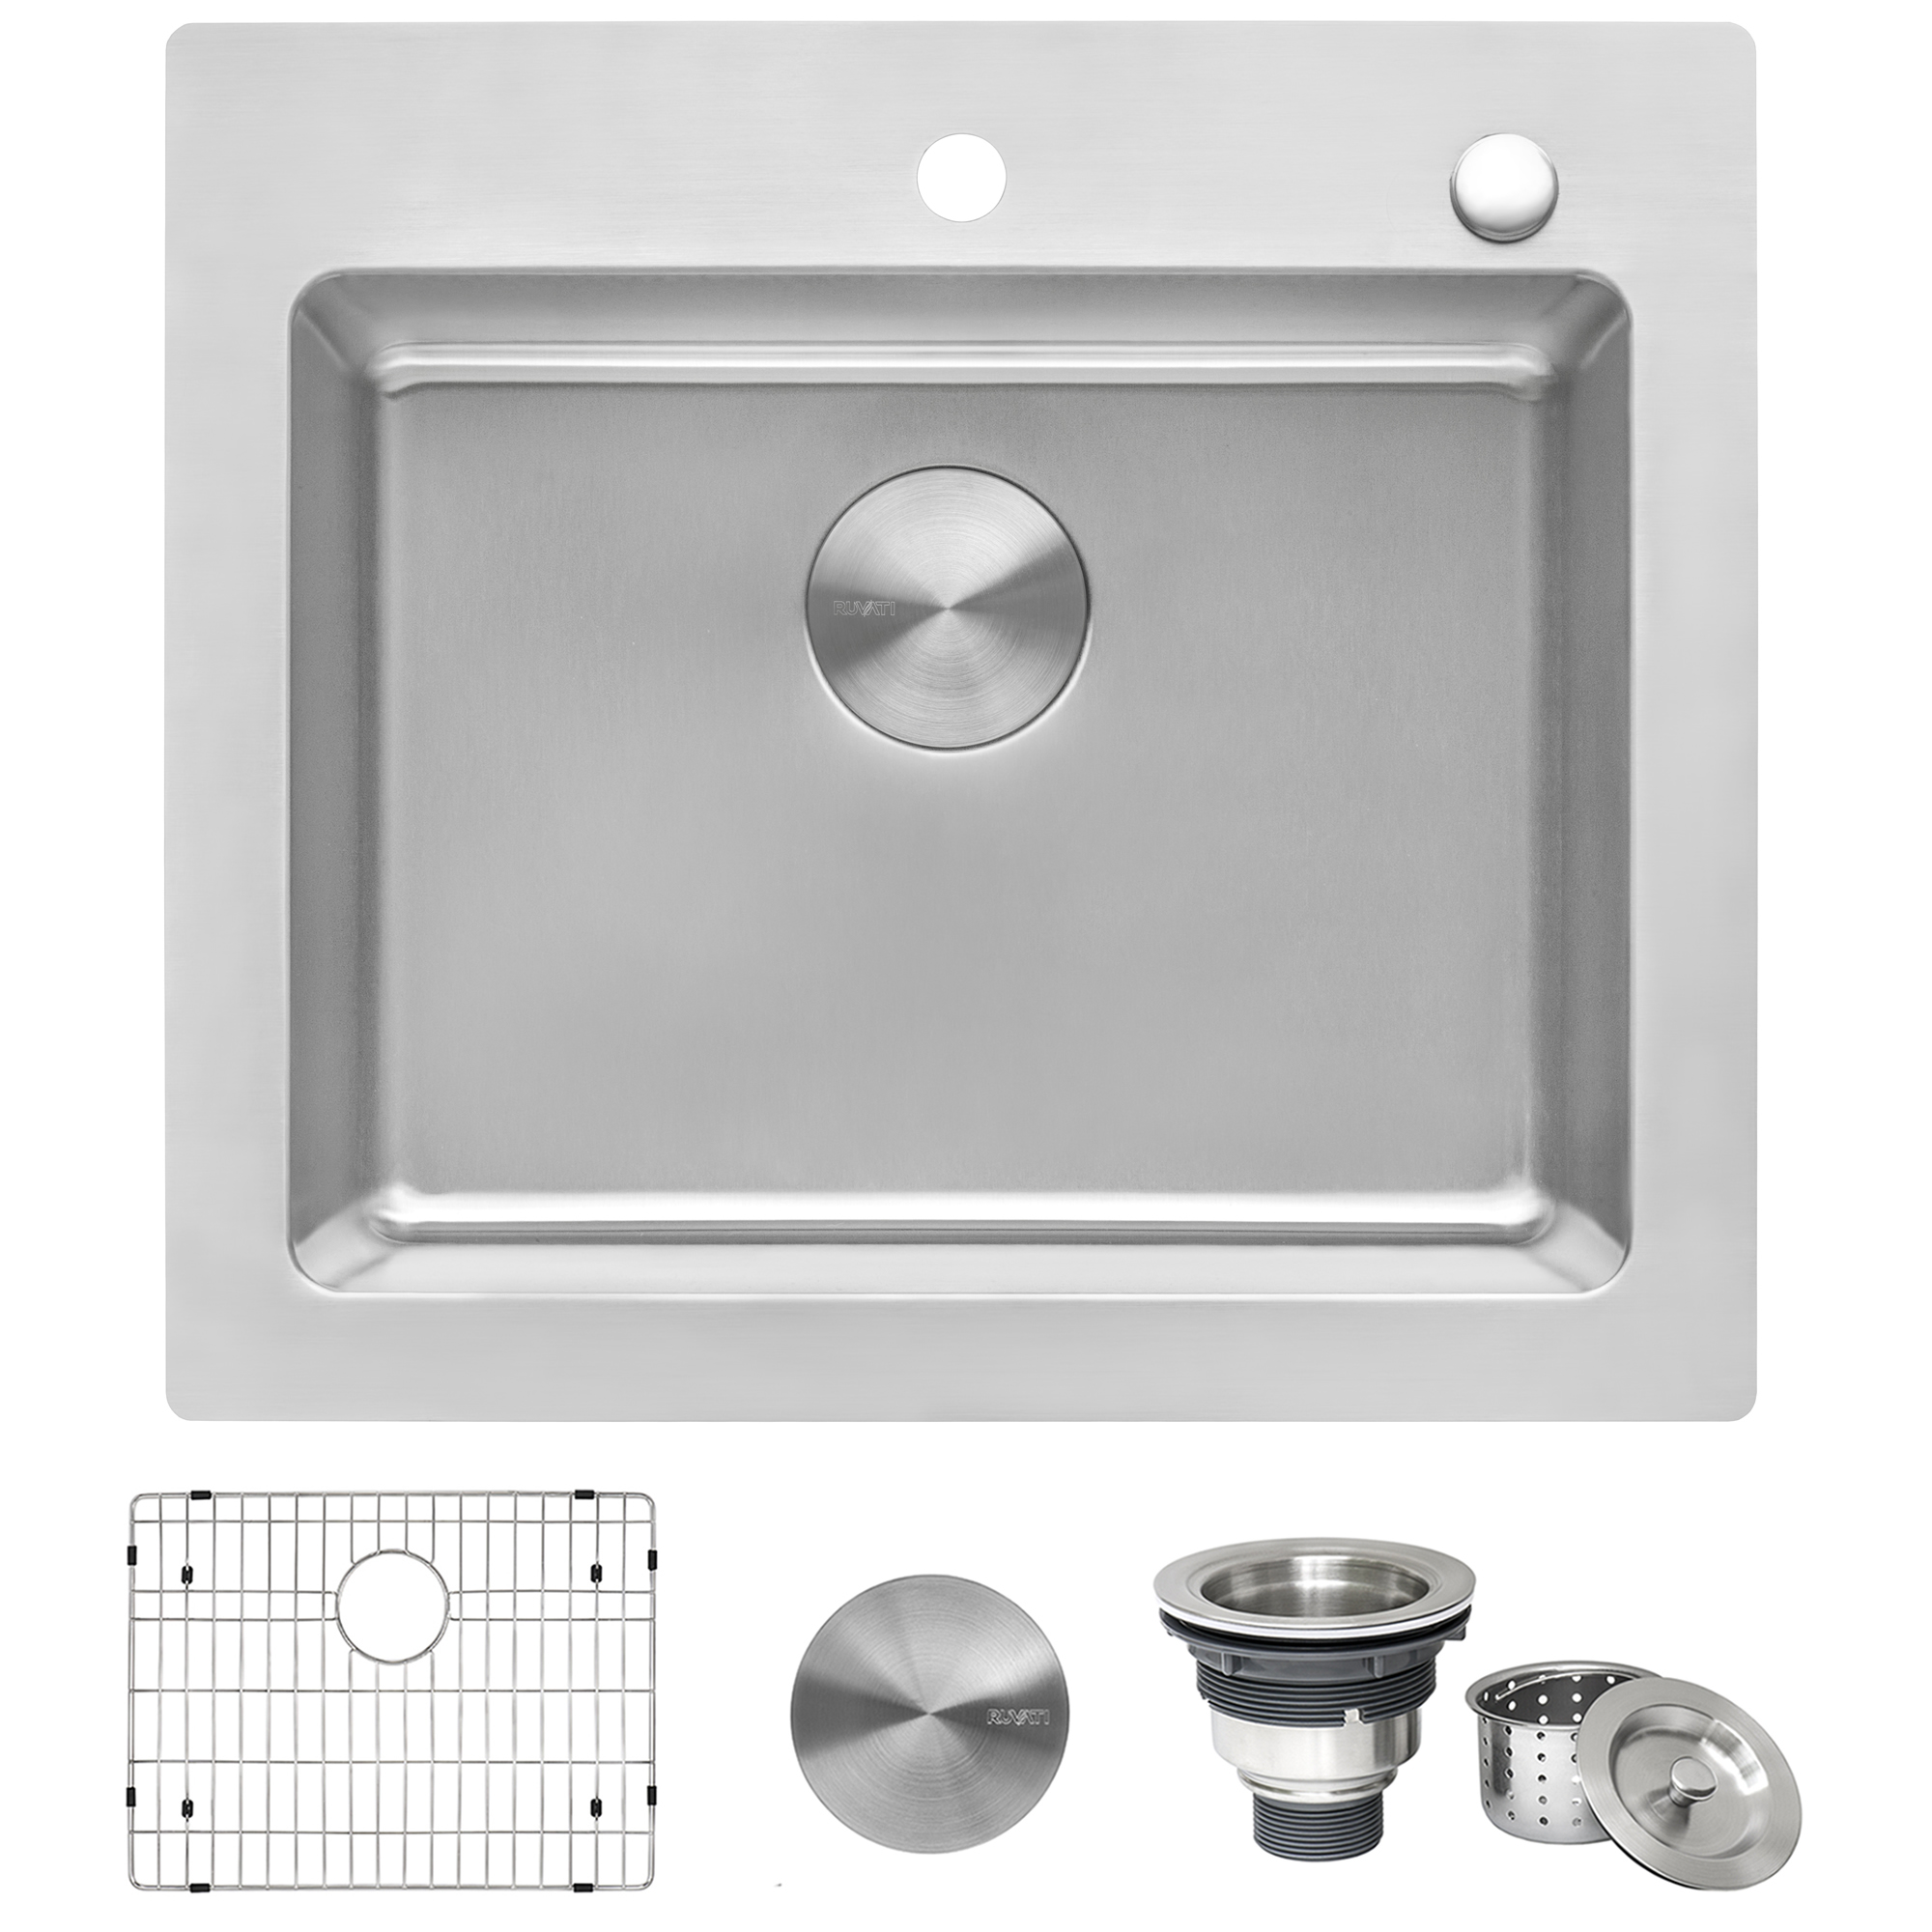 25 x 22 inch drop in topmount kitchen